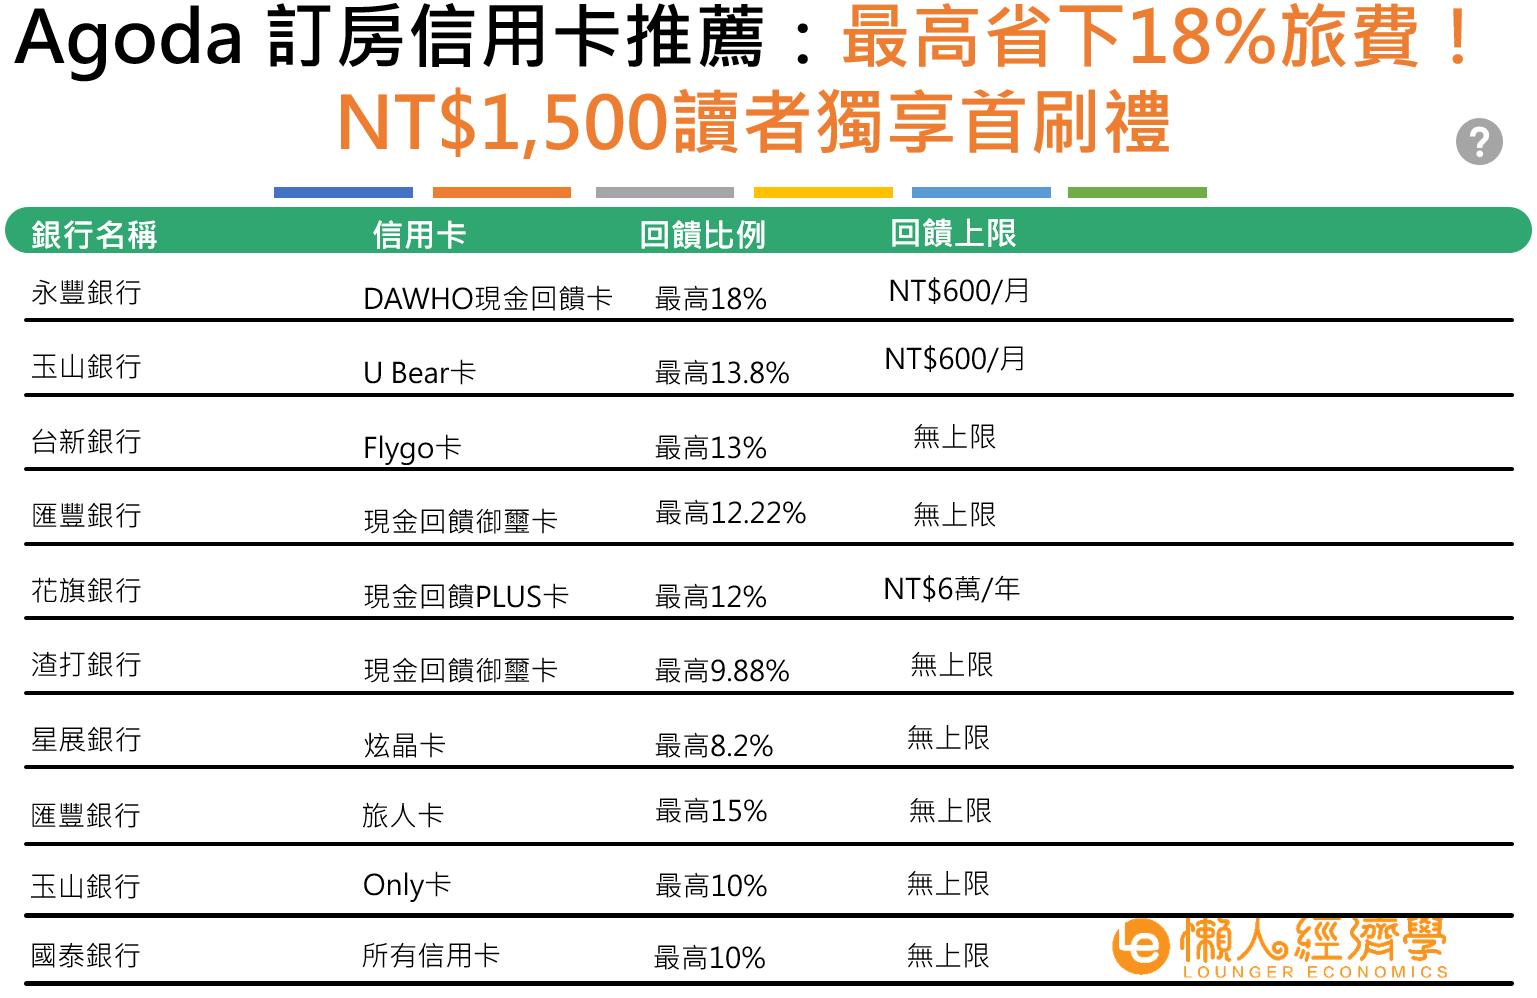 Agoda 信用卡推薦:最高省下18%旅費!NT$1,500讀者獨享首刷禮